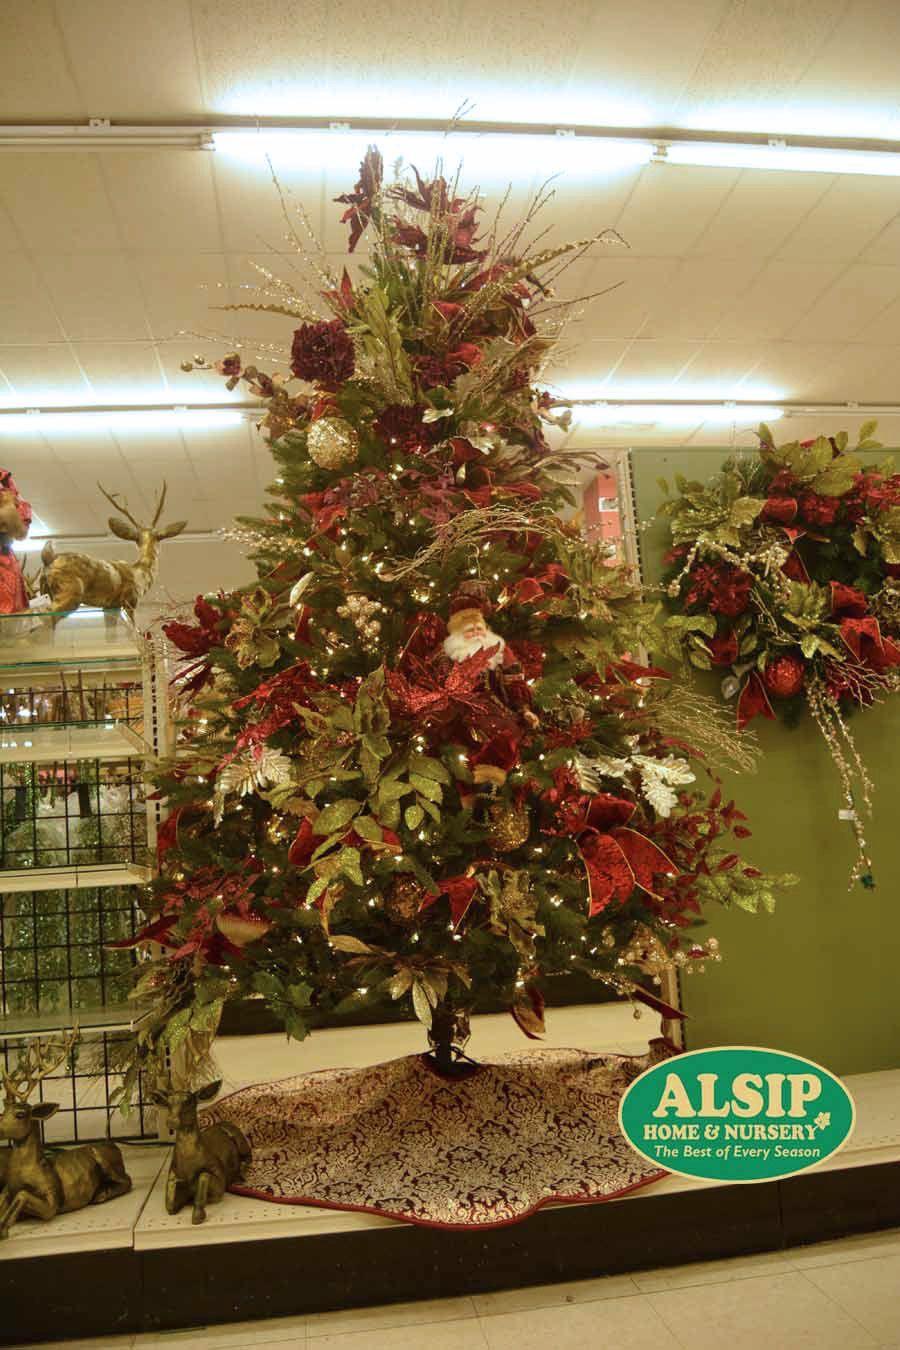 Best of the Region 2014 Christmas tree design, Christmas